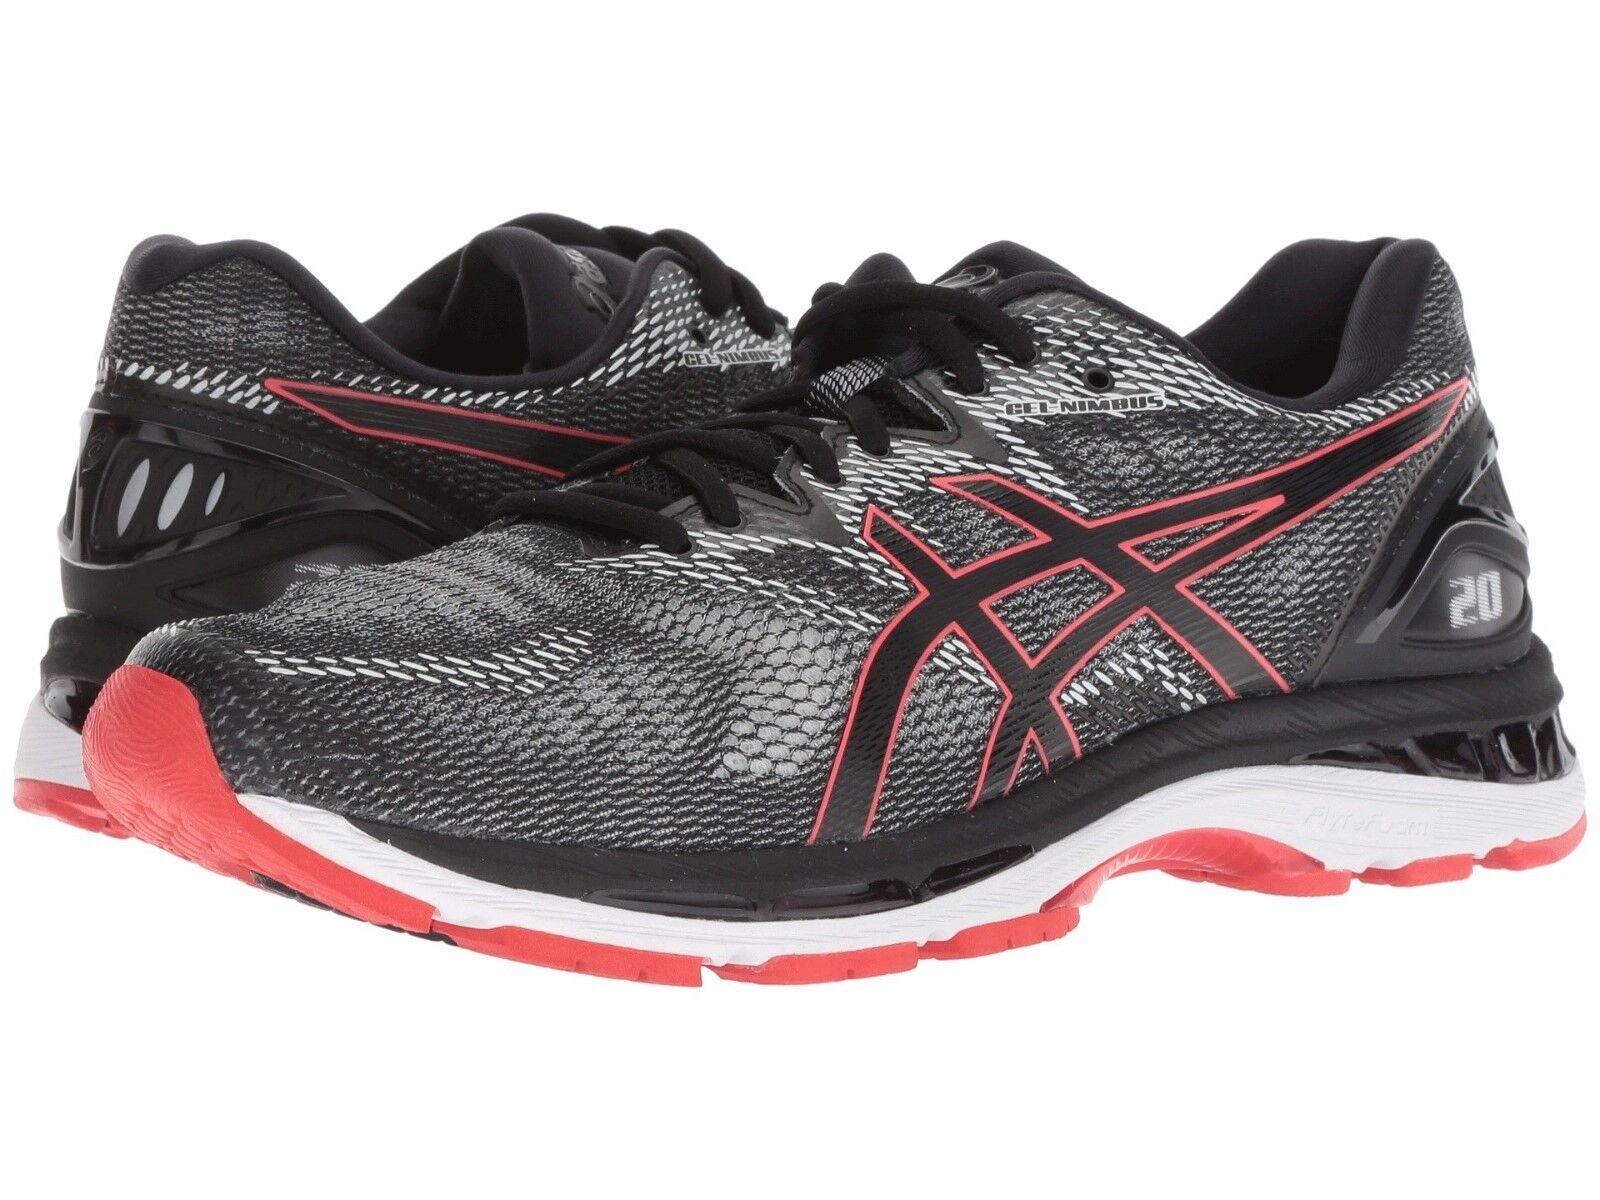 Asics - Men Gel Nimbus 20 Running Sneakers, Black Red Alert  Medium (M, D)